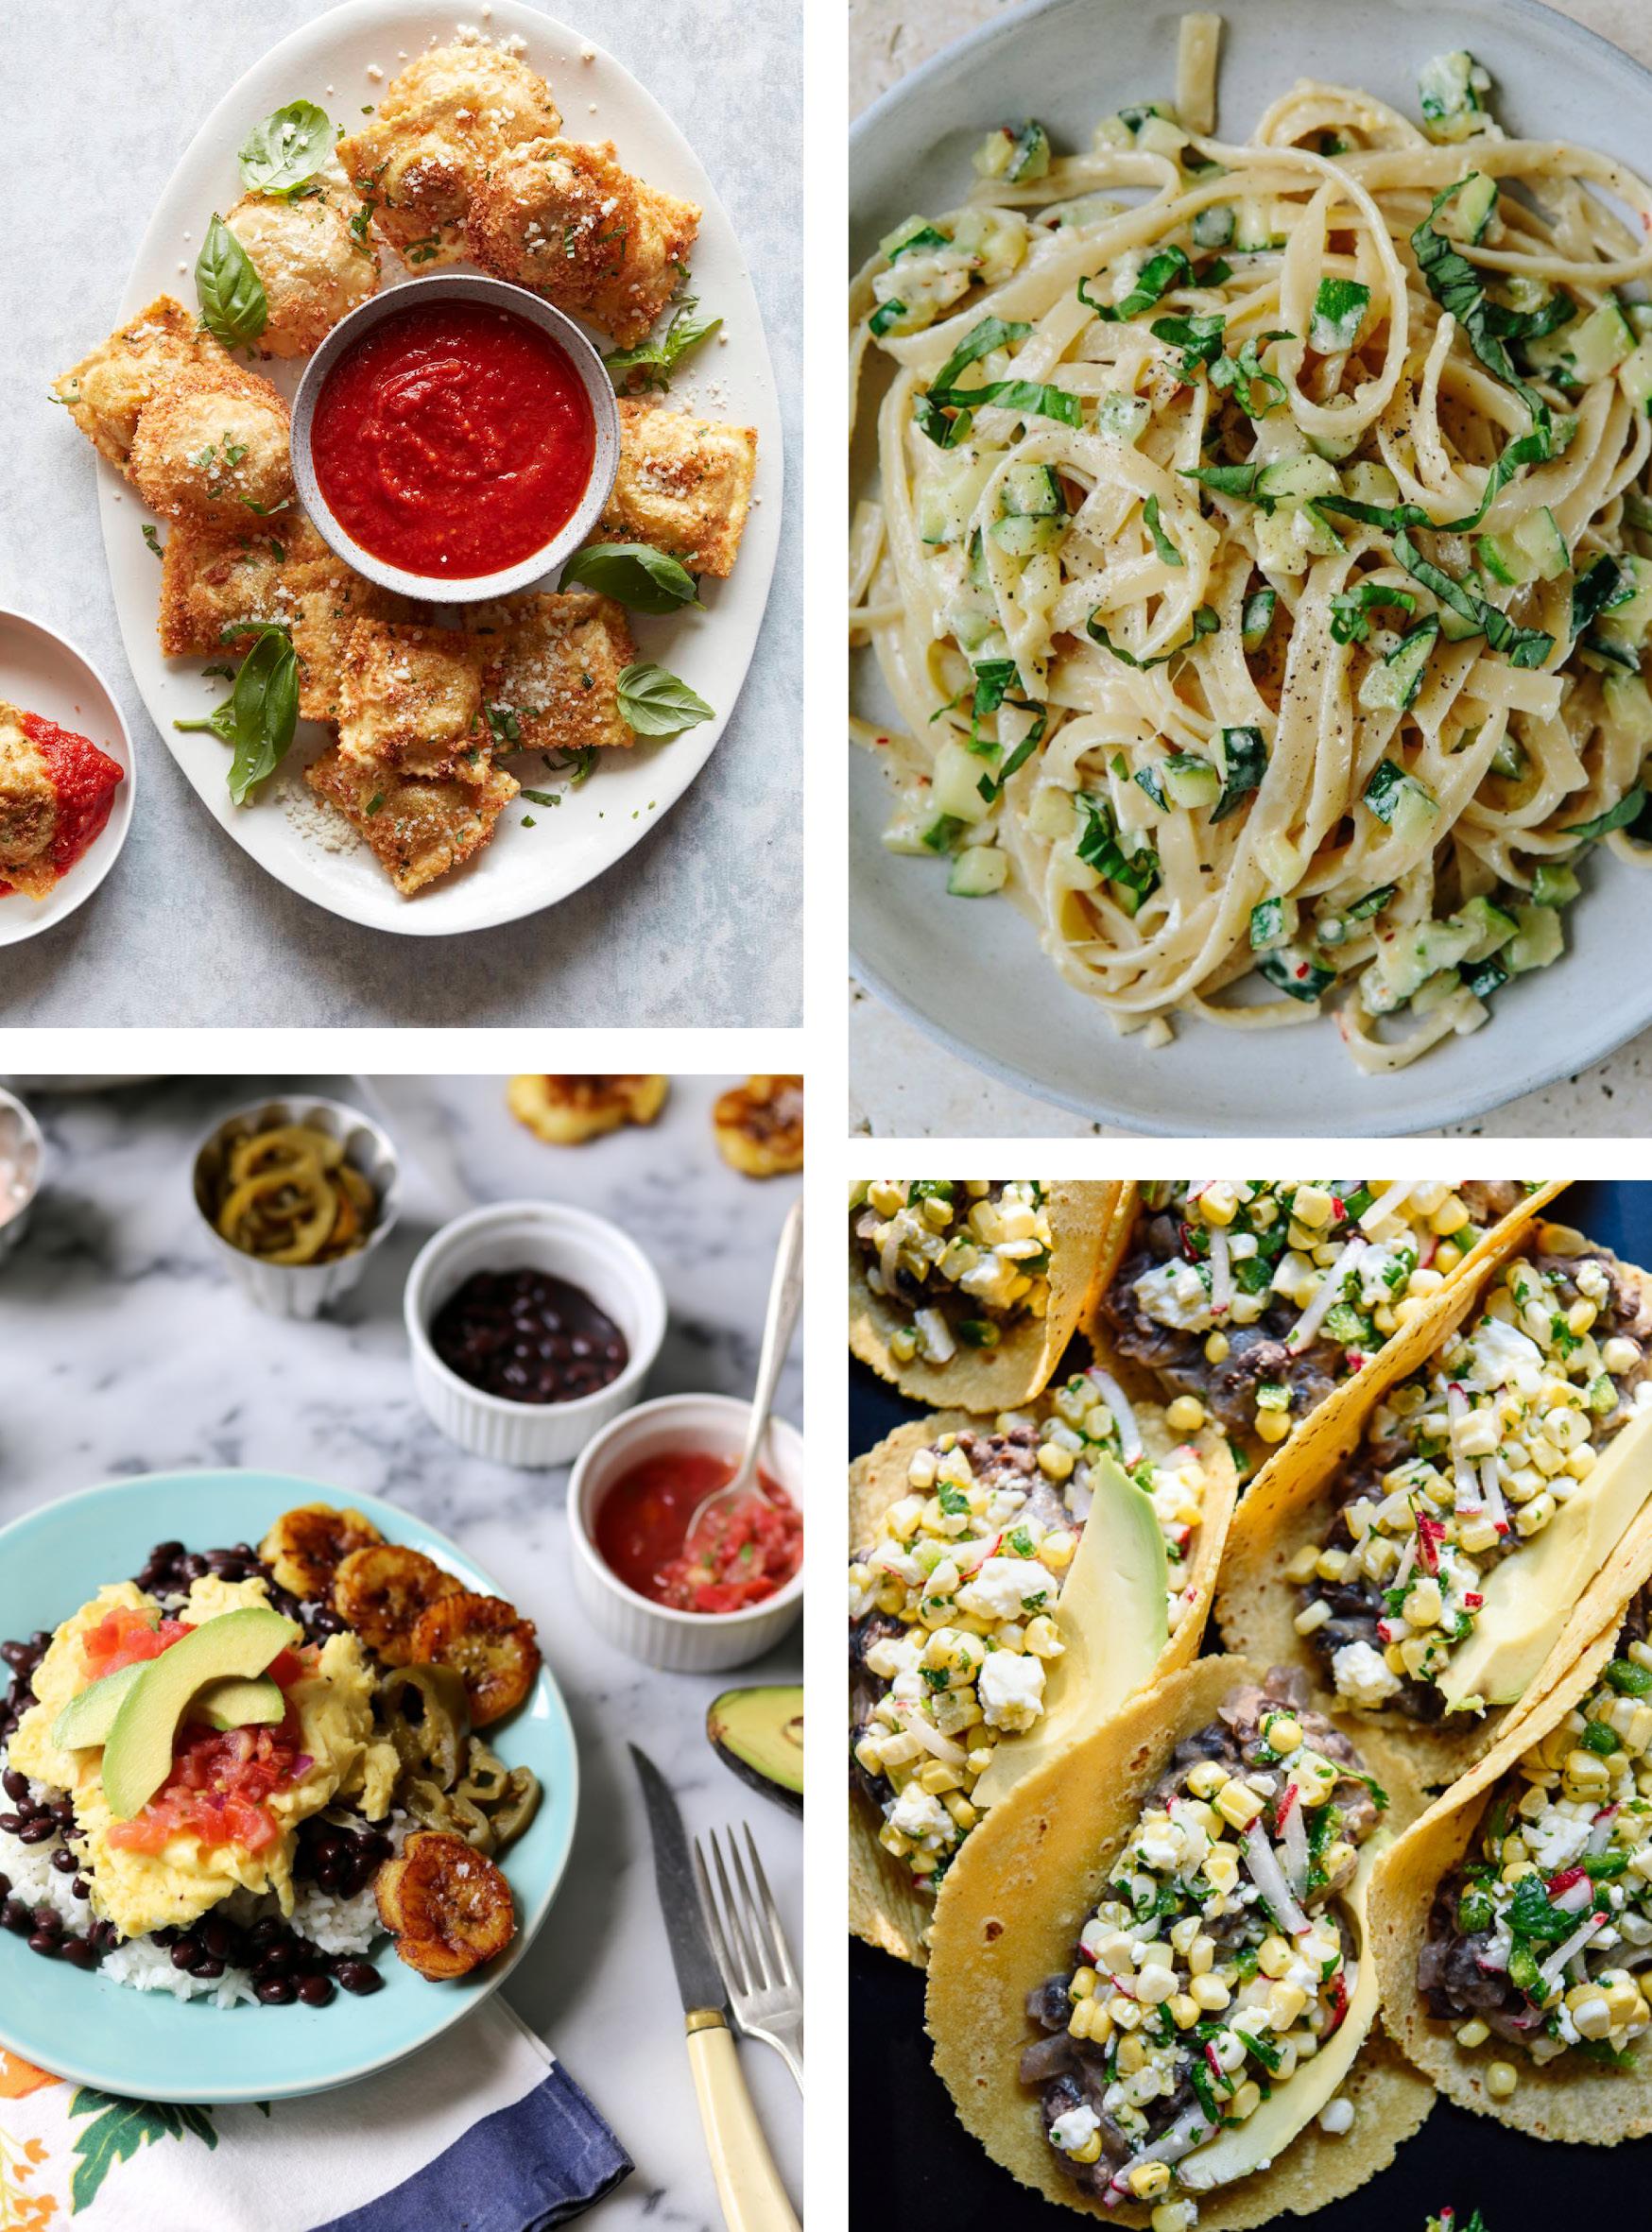 FoodMood Juin 2016 - www.theflyingflour.com